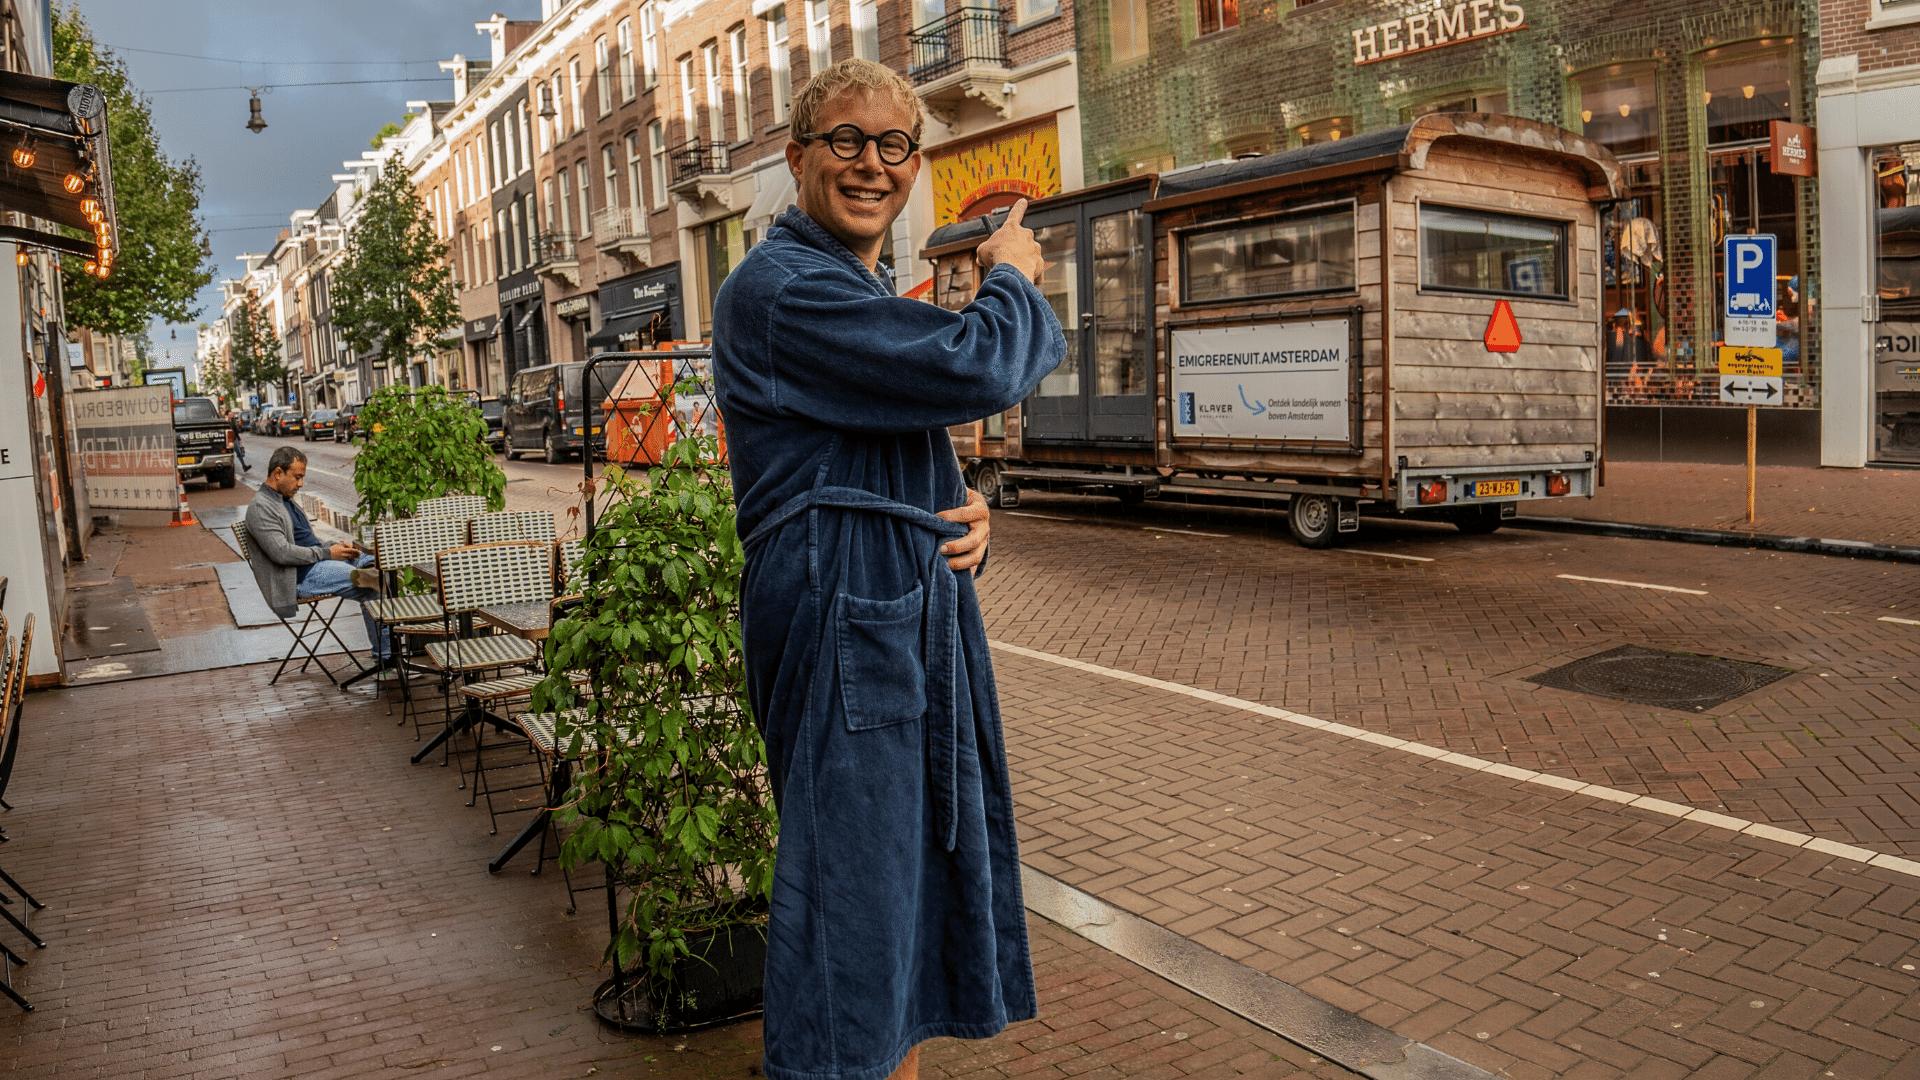 Emigrerenuit.Amsterdam - Deel #2